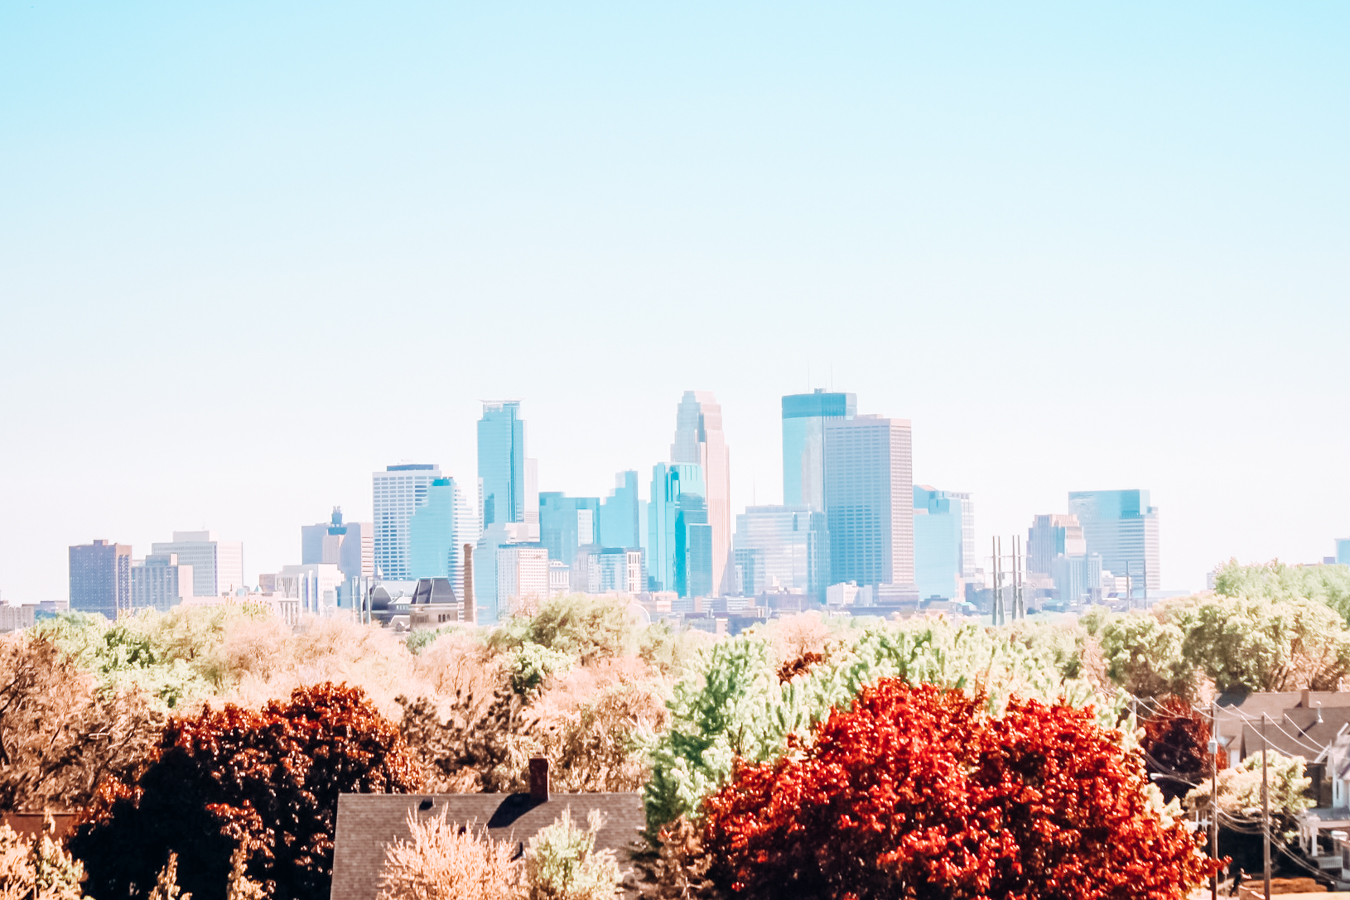 The skyline of Minneapolis